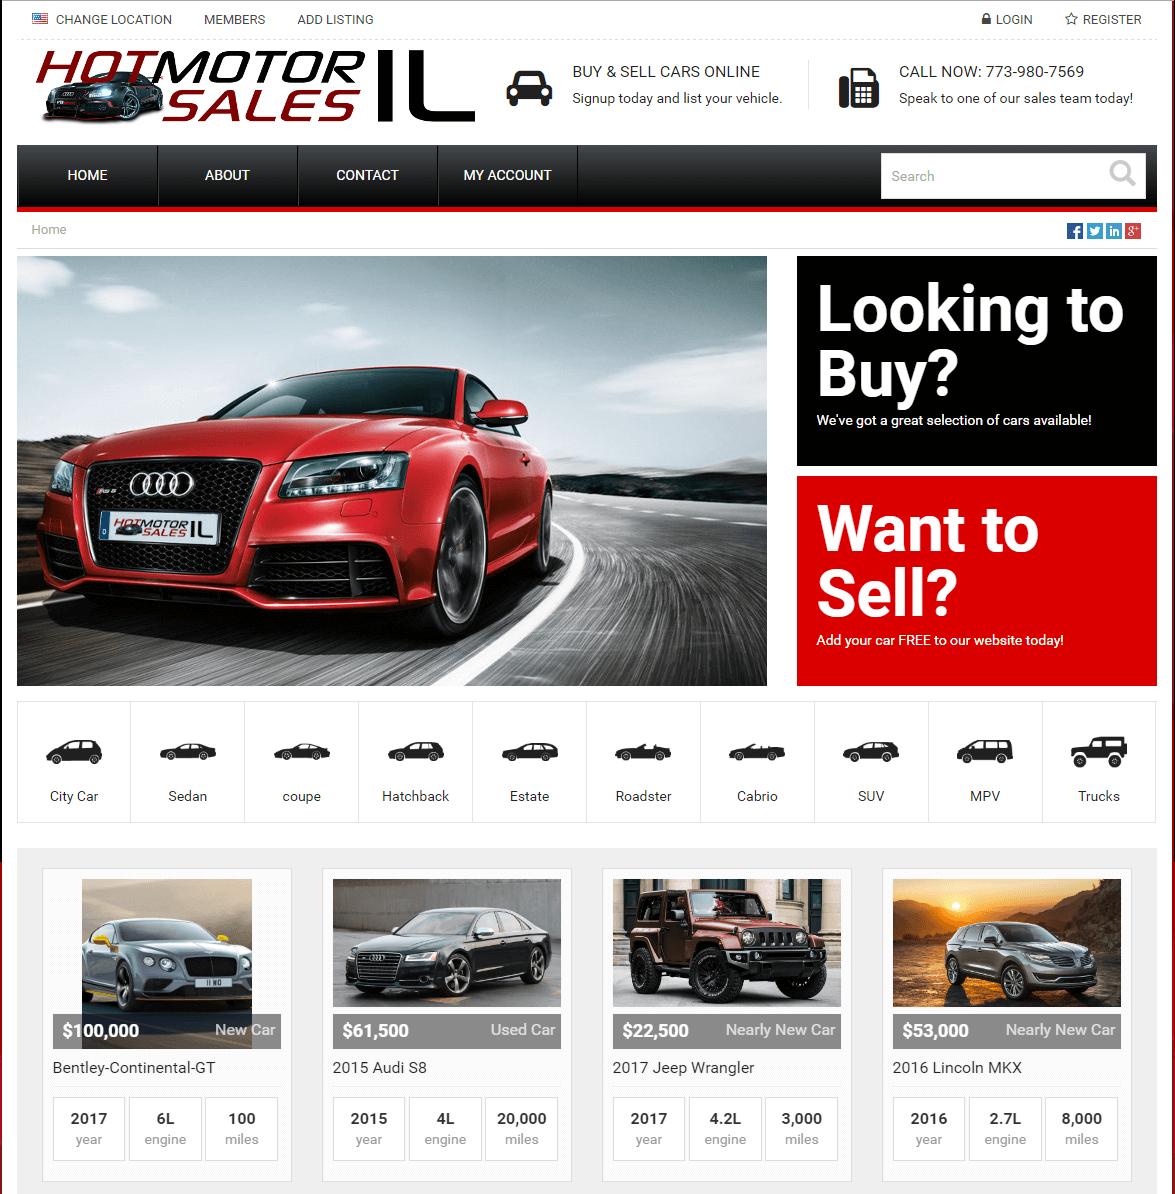 Hot Motor Sales IL